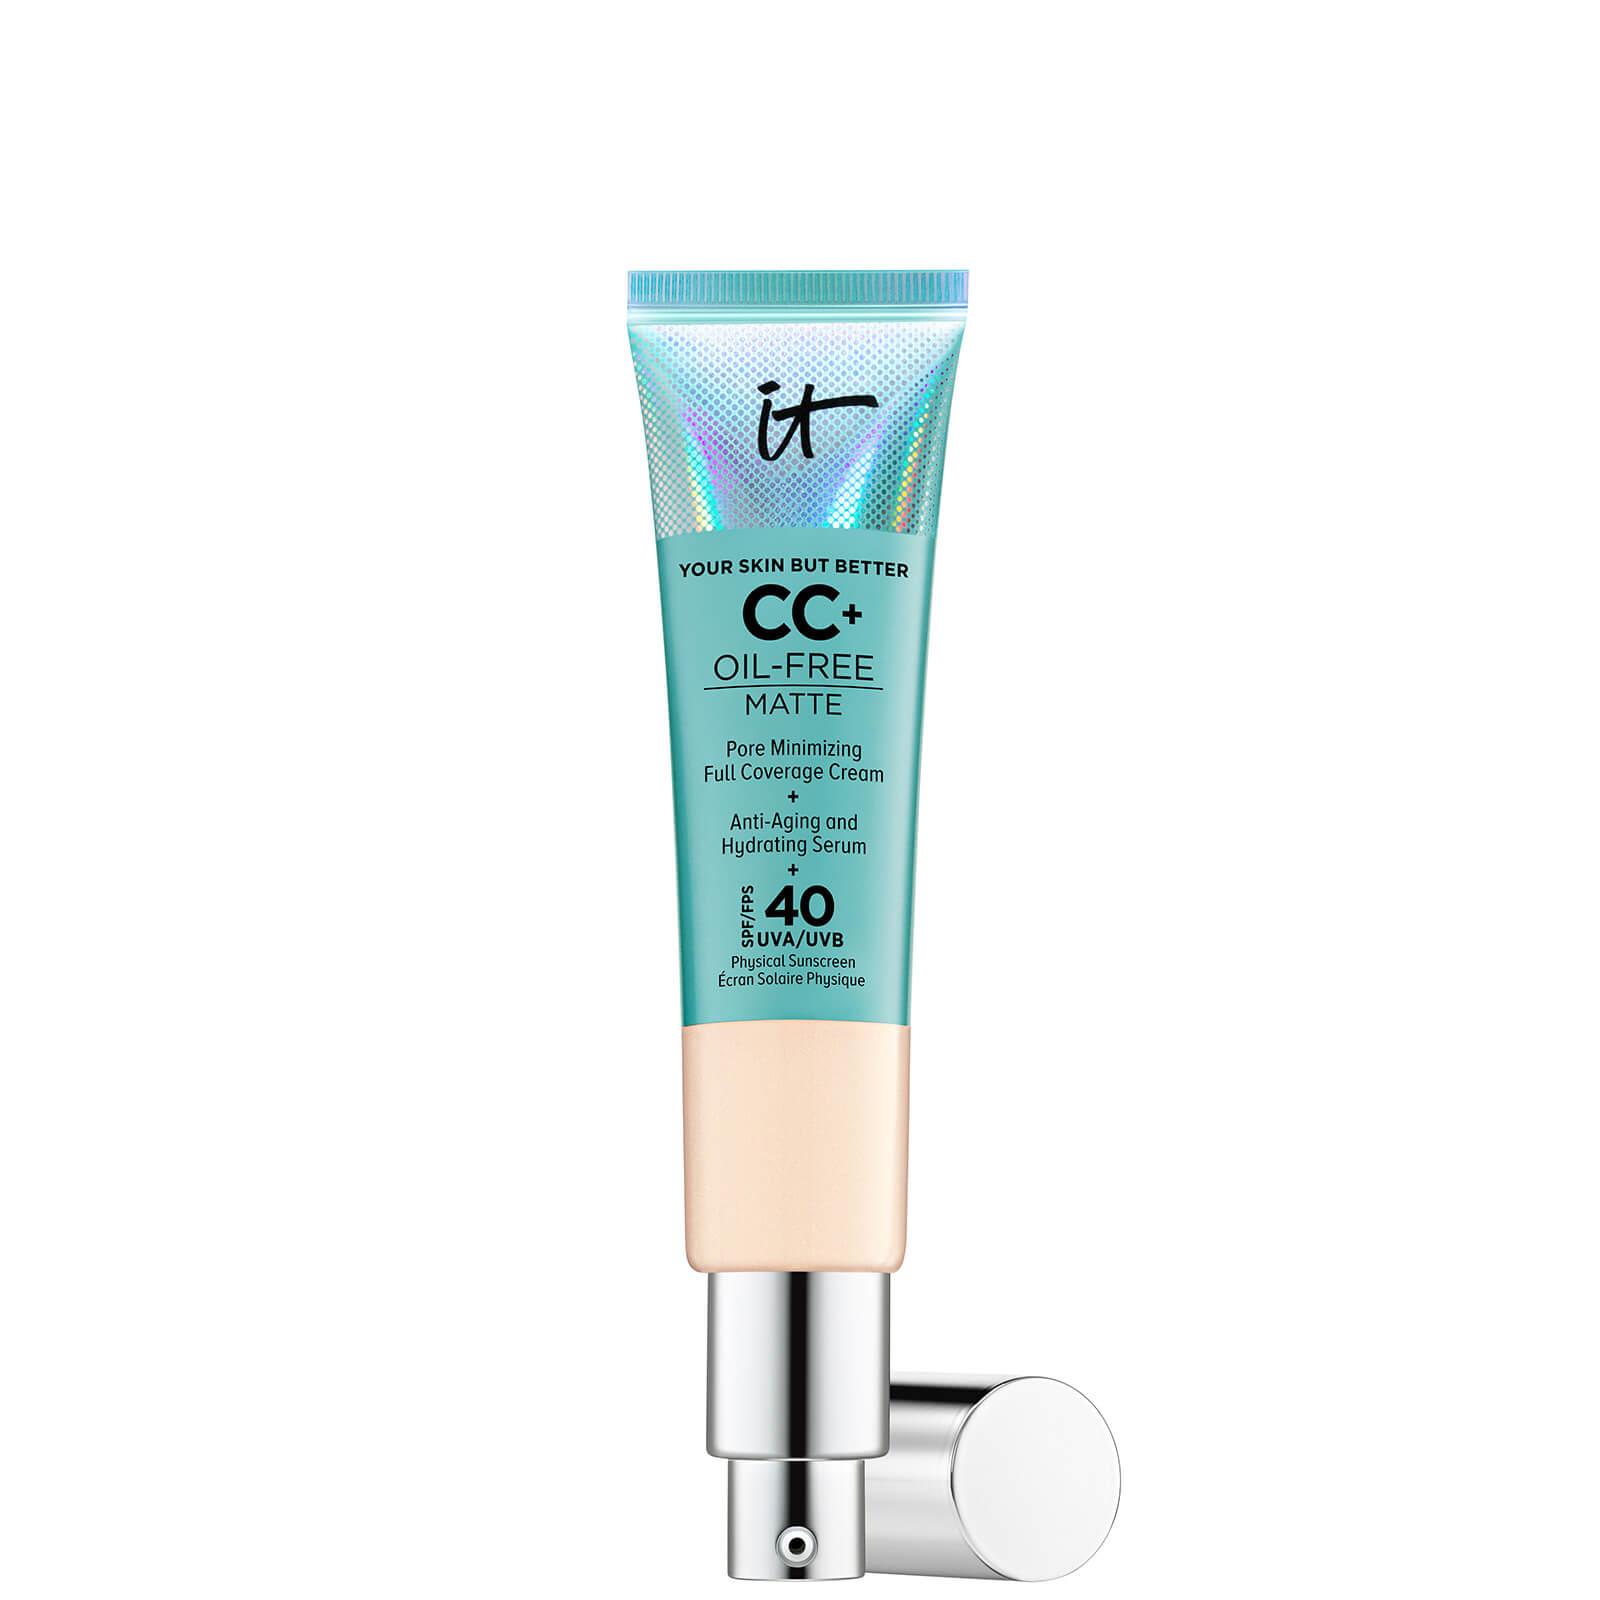 Купить IT Cosmetics Your Skin But Better CC+ Oil-Free Matte SPF40 32ml (Various Shades) - Light